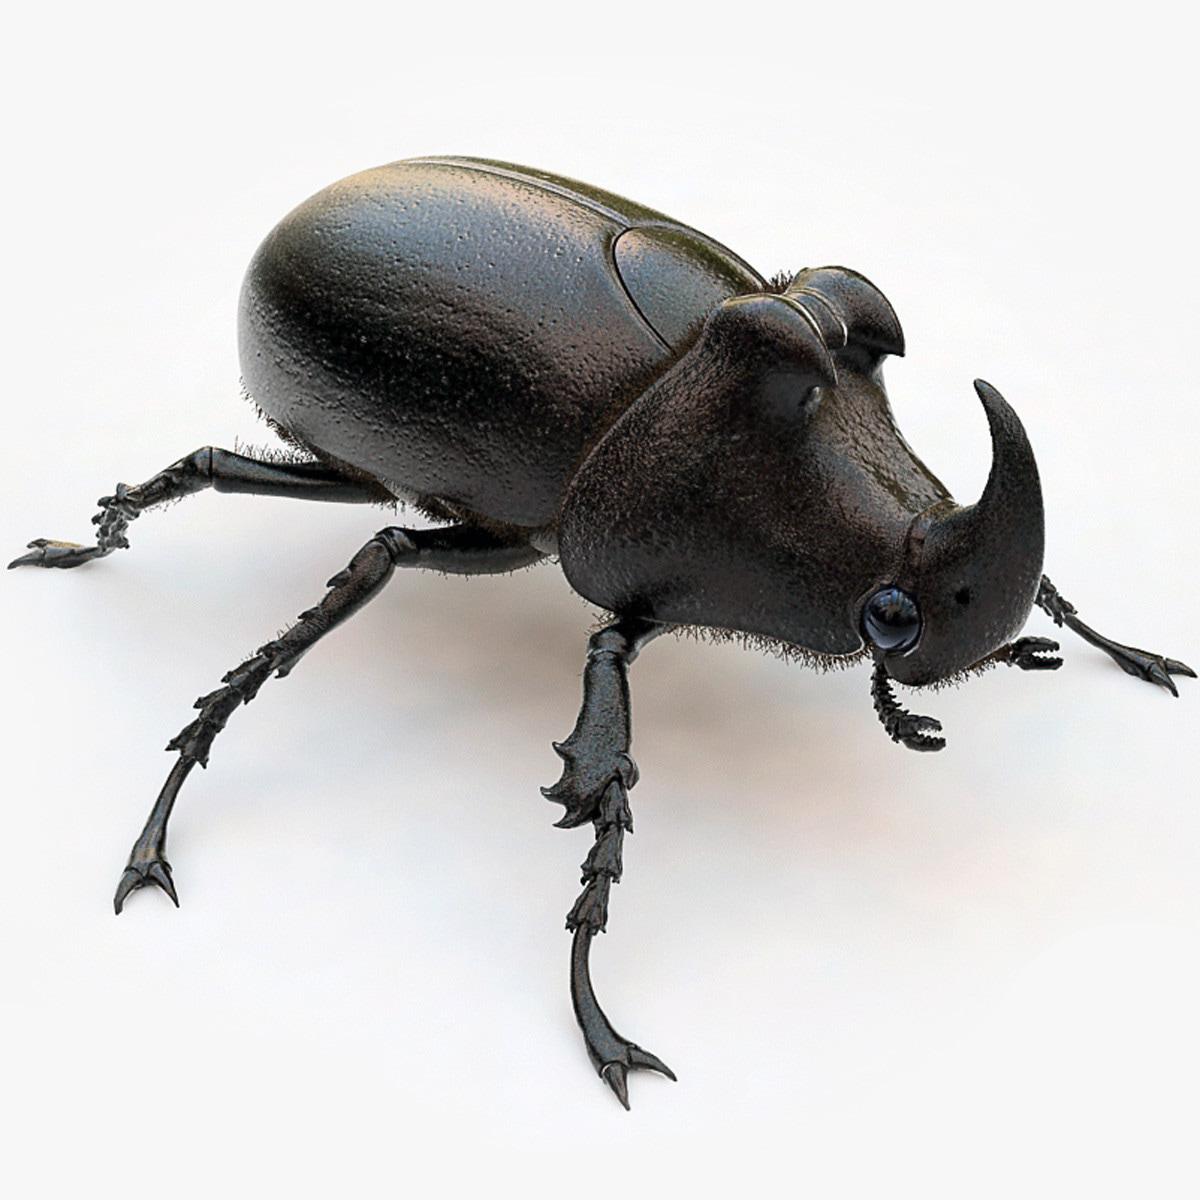 Rhinoceros_Beetle_00.jpgf0dcdc86-8613-41ea-88a5-abfdf8d6d135Original.jpg